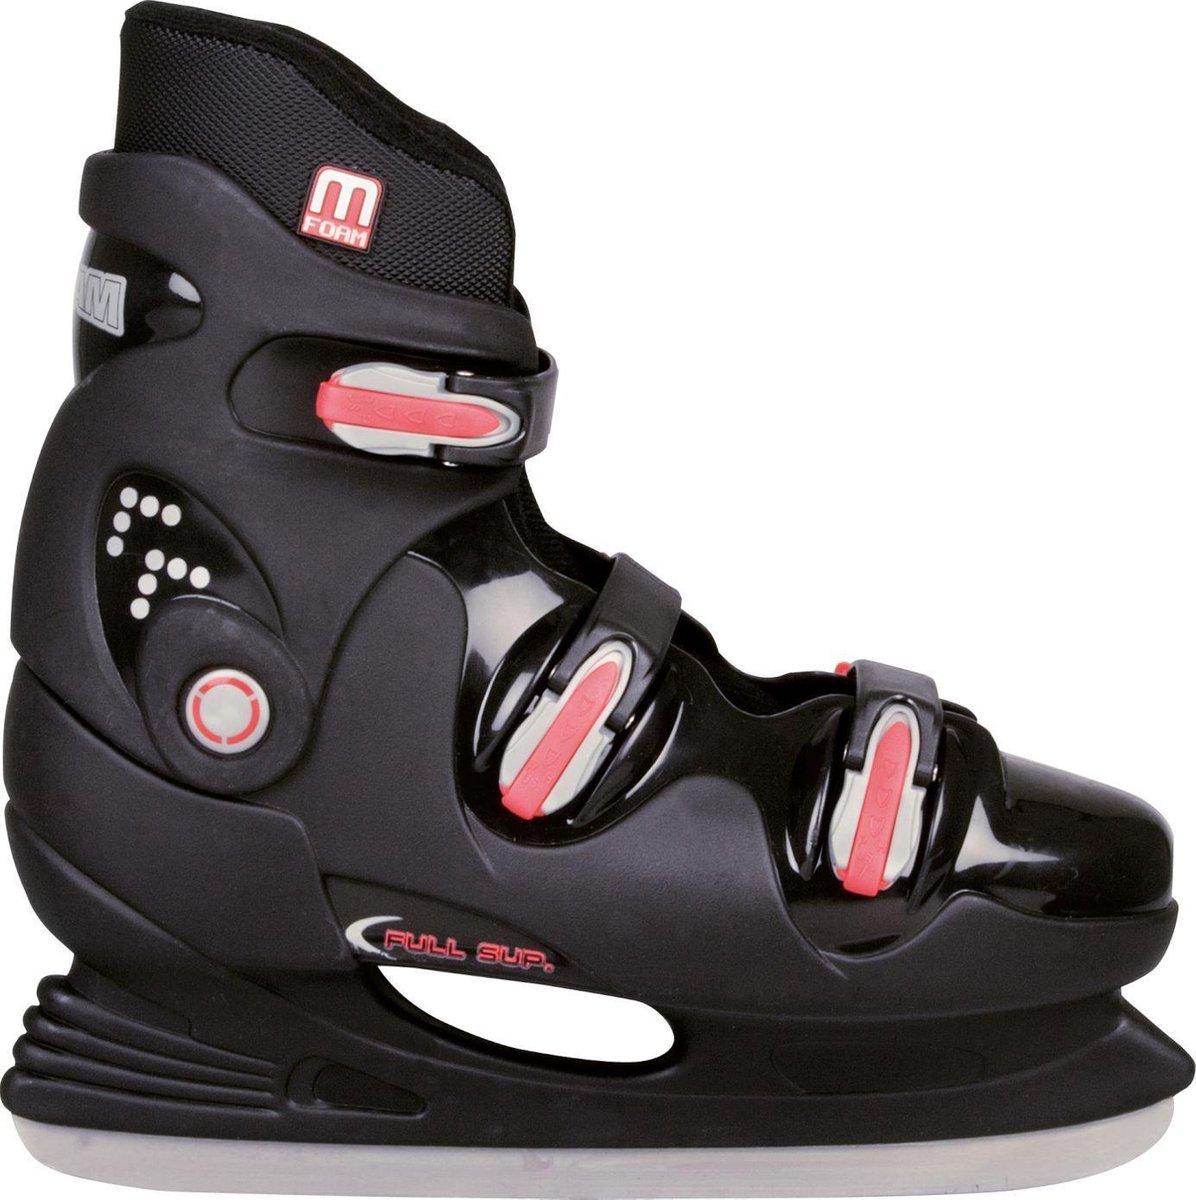 Nijdam IJshockeyschaats - Hardboot - Zwart/Zilver/Rood - 37